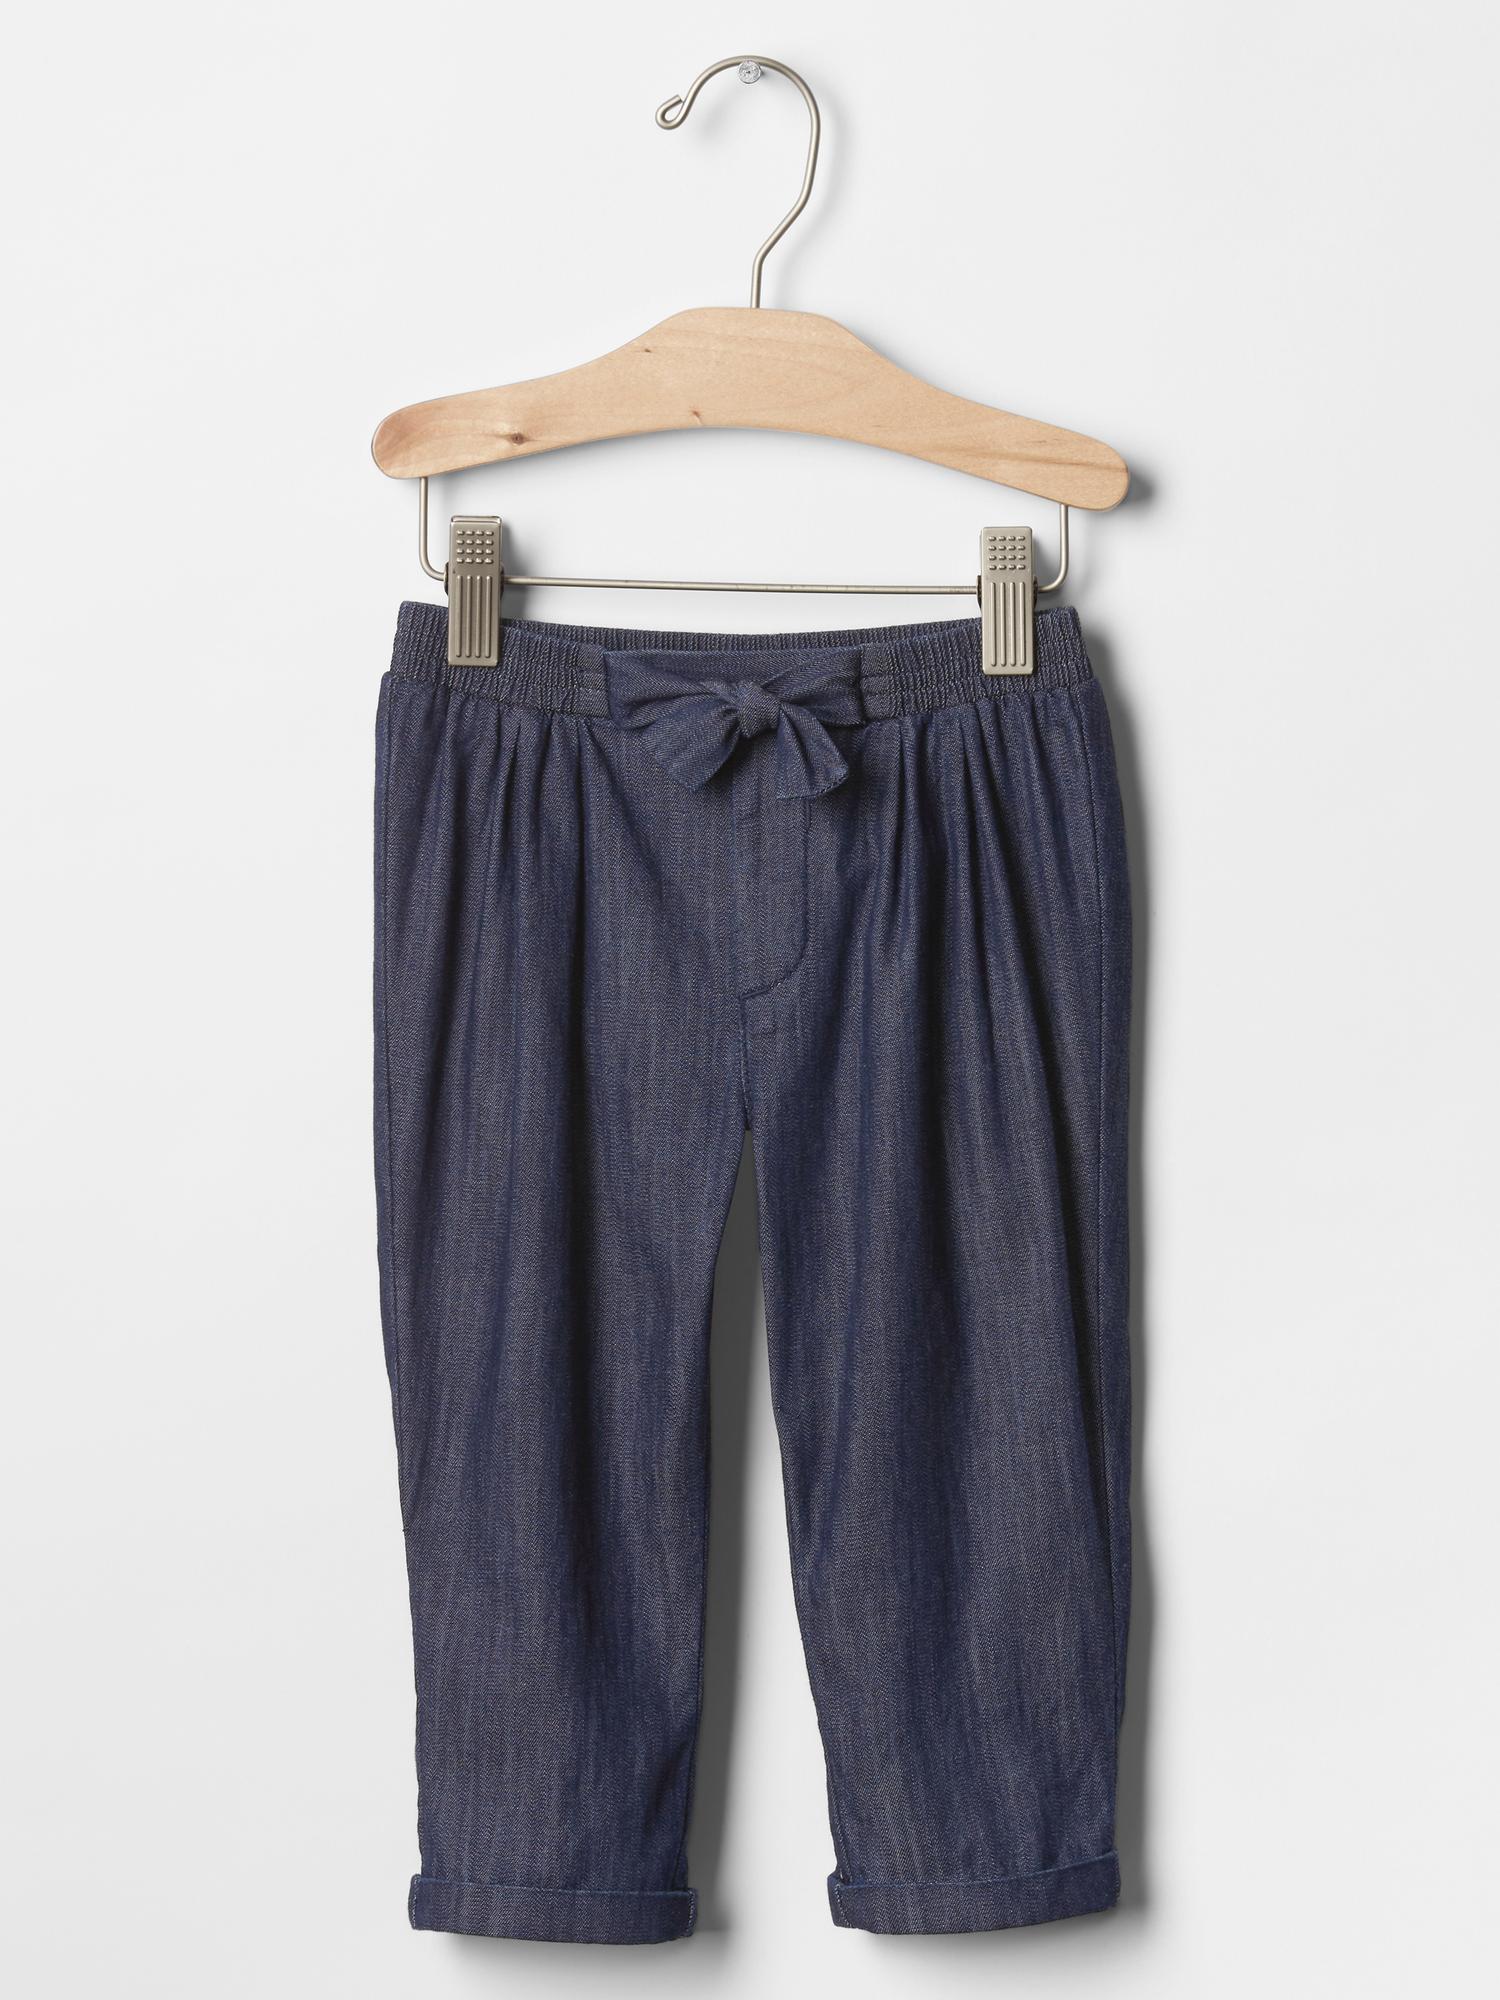 Denim Soft Pants from Baby Gap